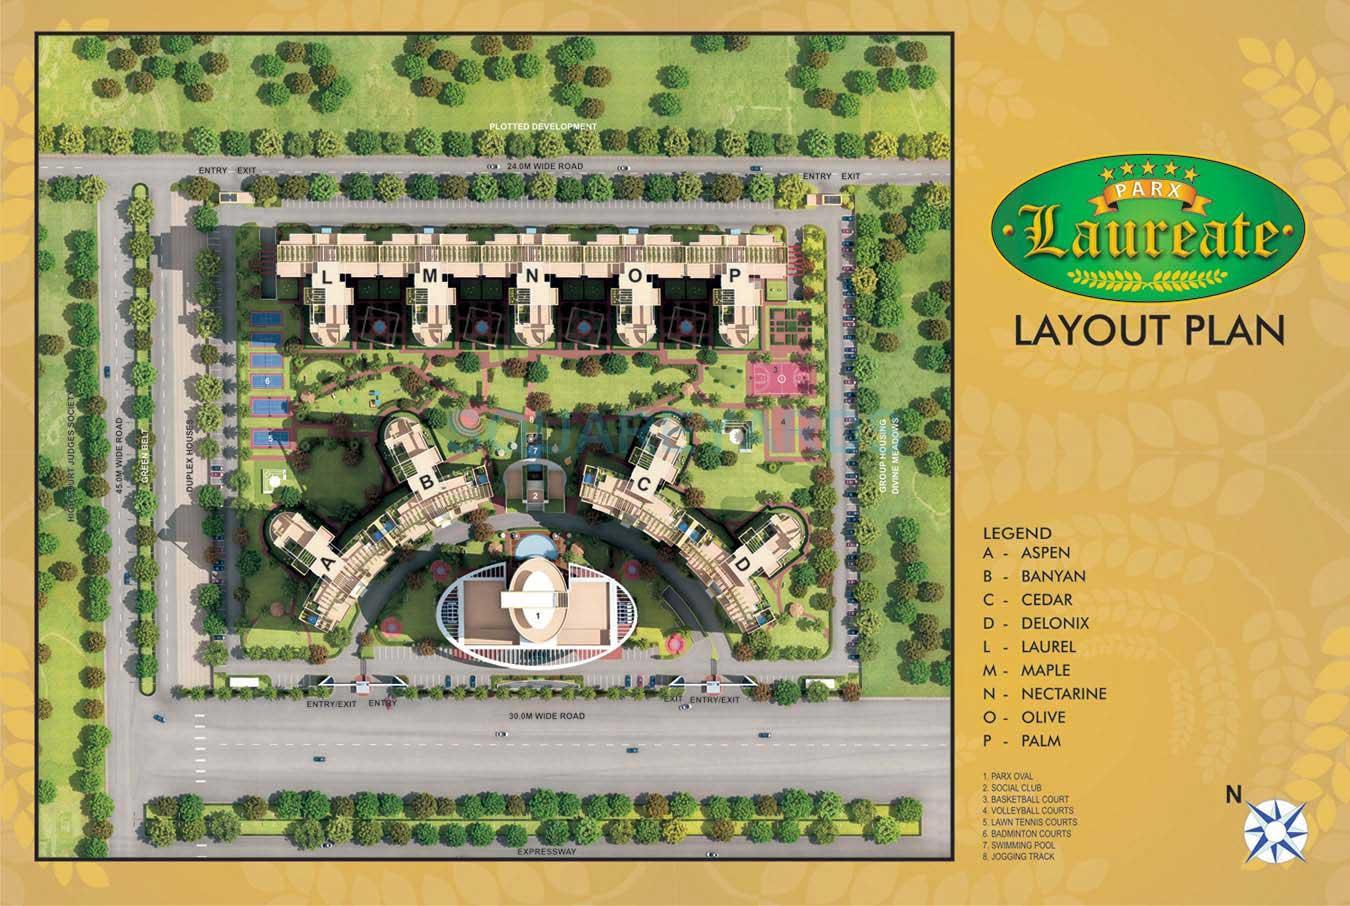 parx laureate master plan image1